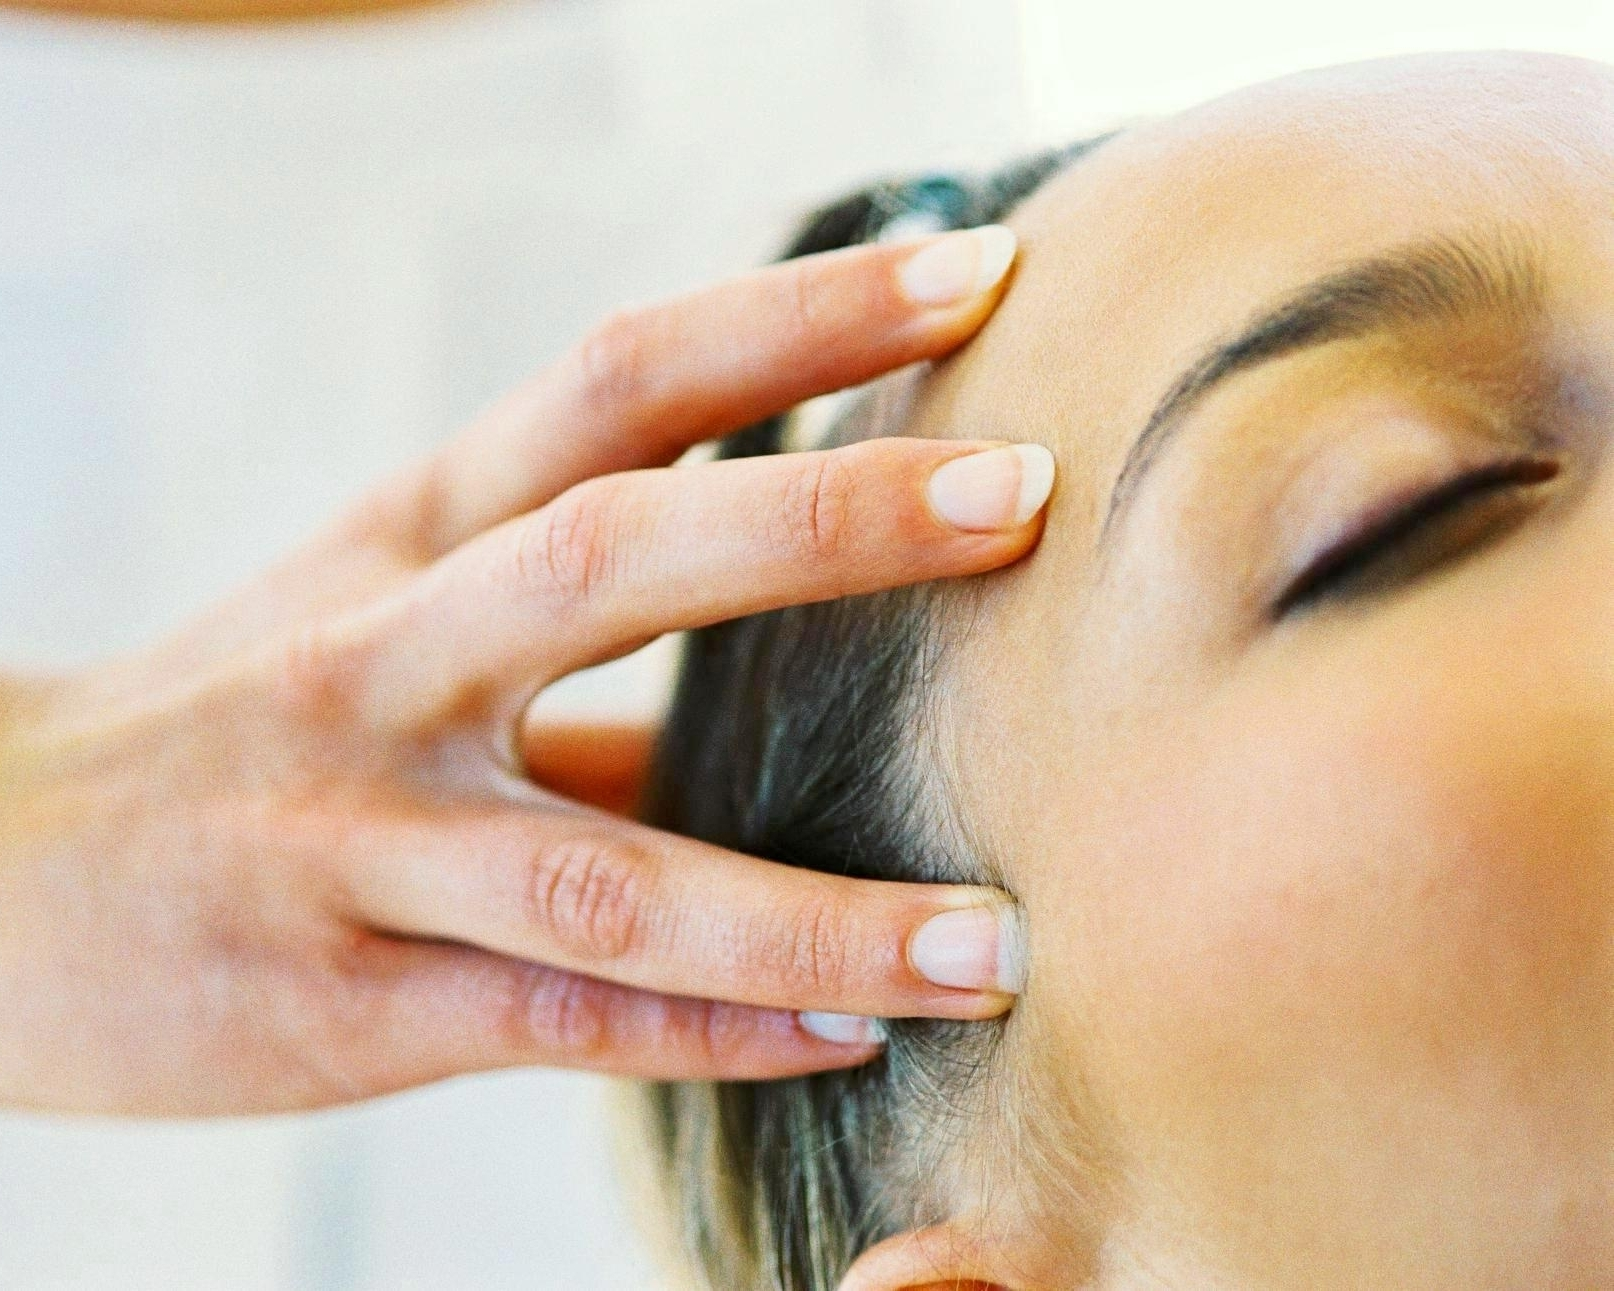 Face and Head Massage - Massotherapy Zeina Raya